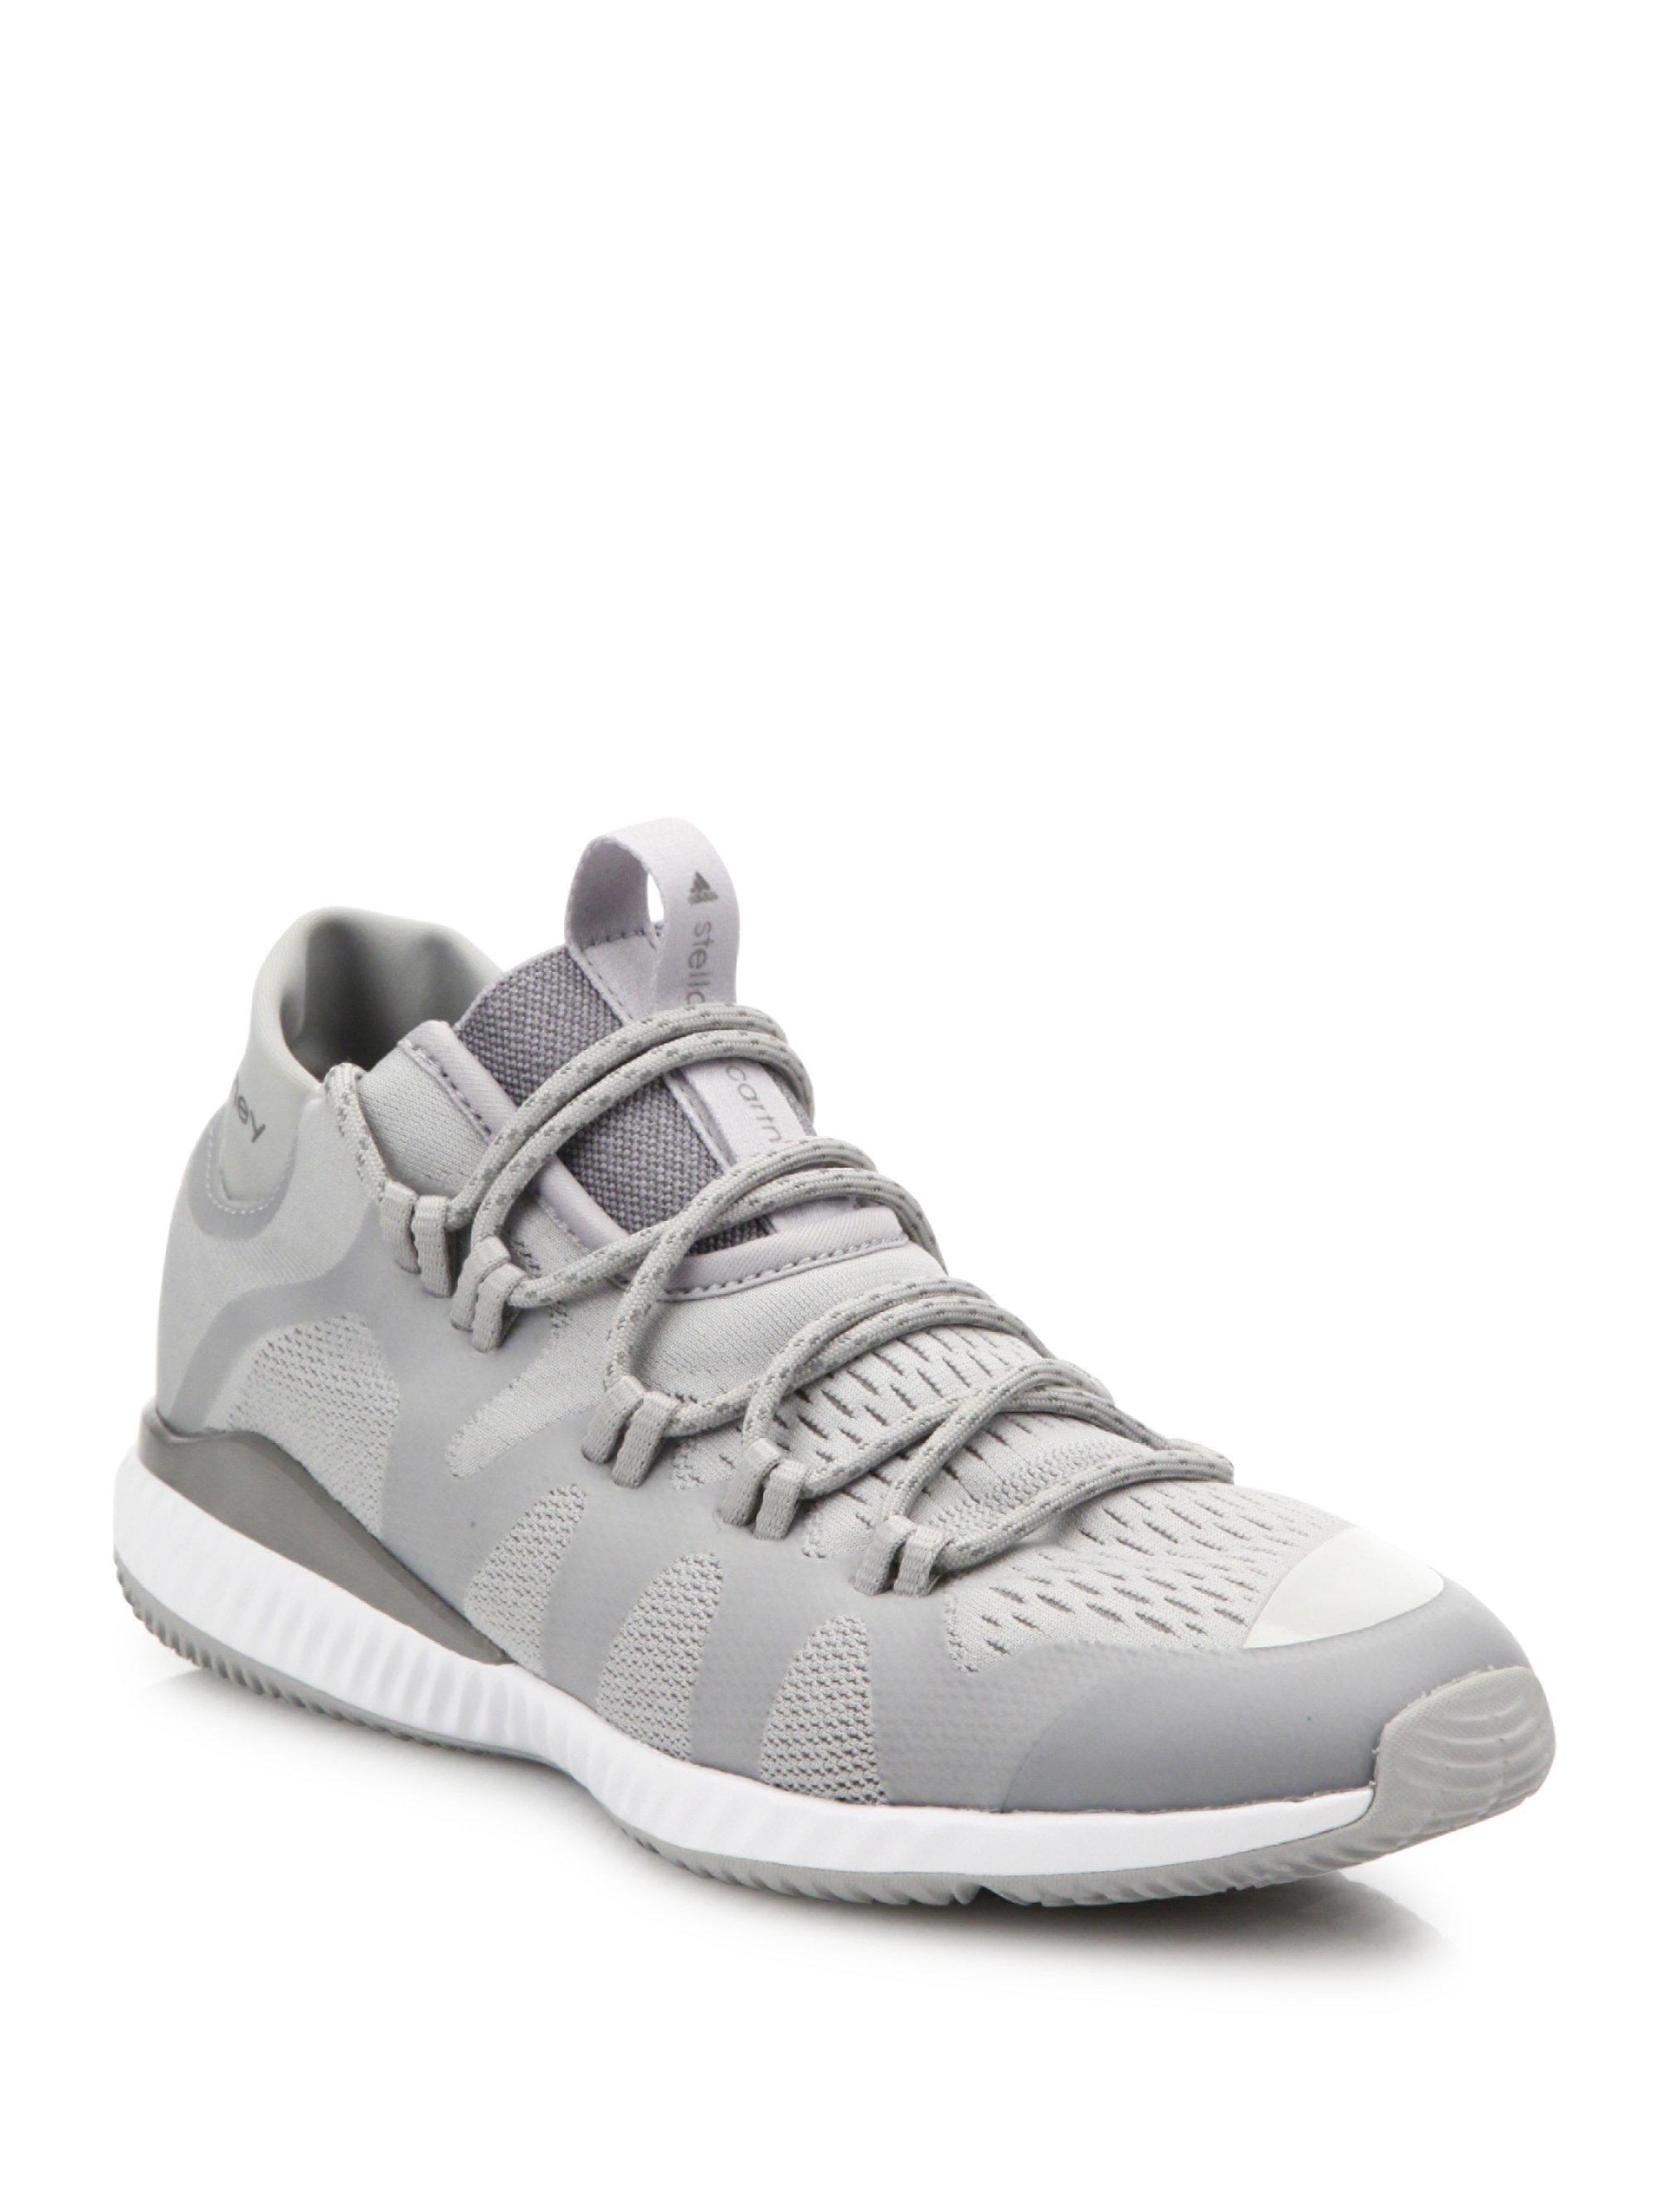 9e4de7f45 adidas By Stella McCartney Crazymove Bounce Mid-top Trainer Sneakers ...